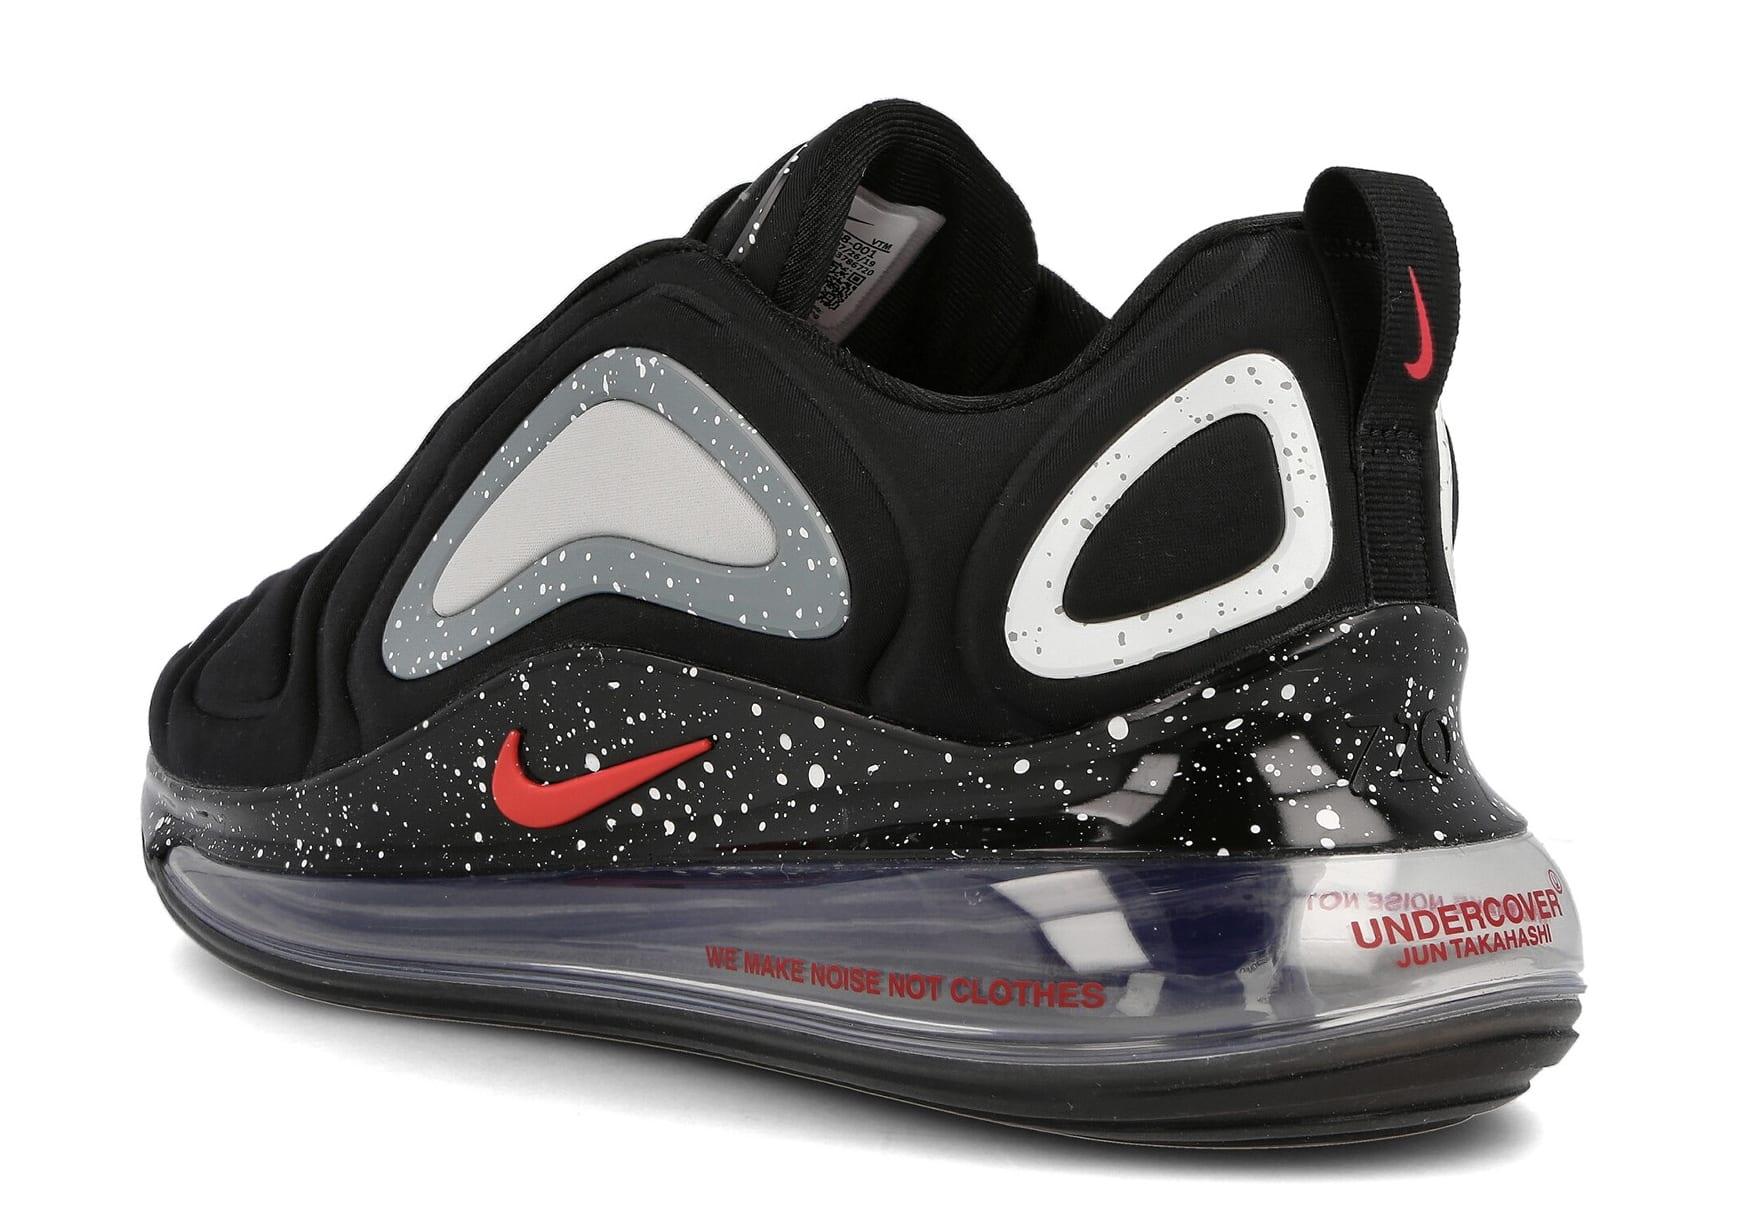 Undercover x Nike Air Max 720 CN2408-001 (Heel)